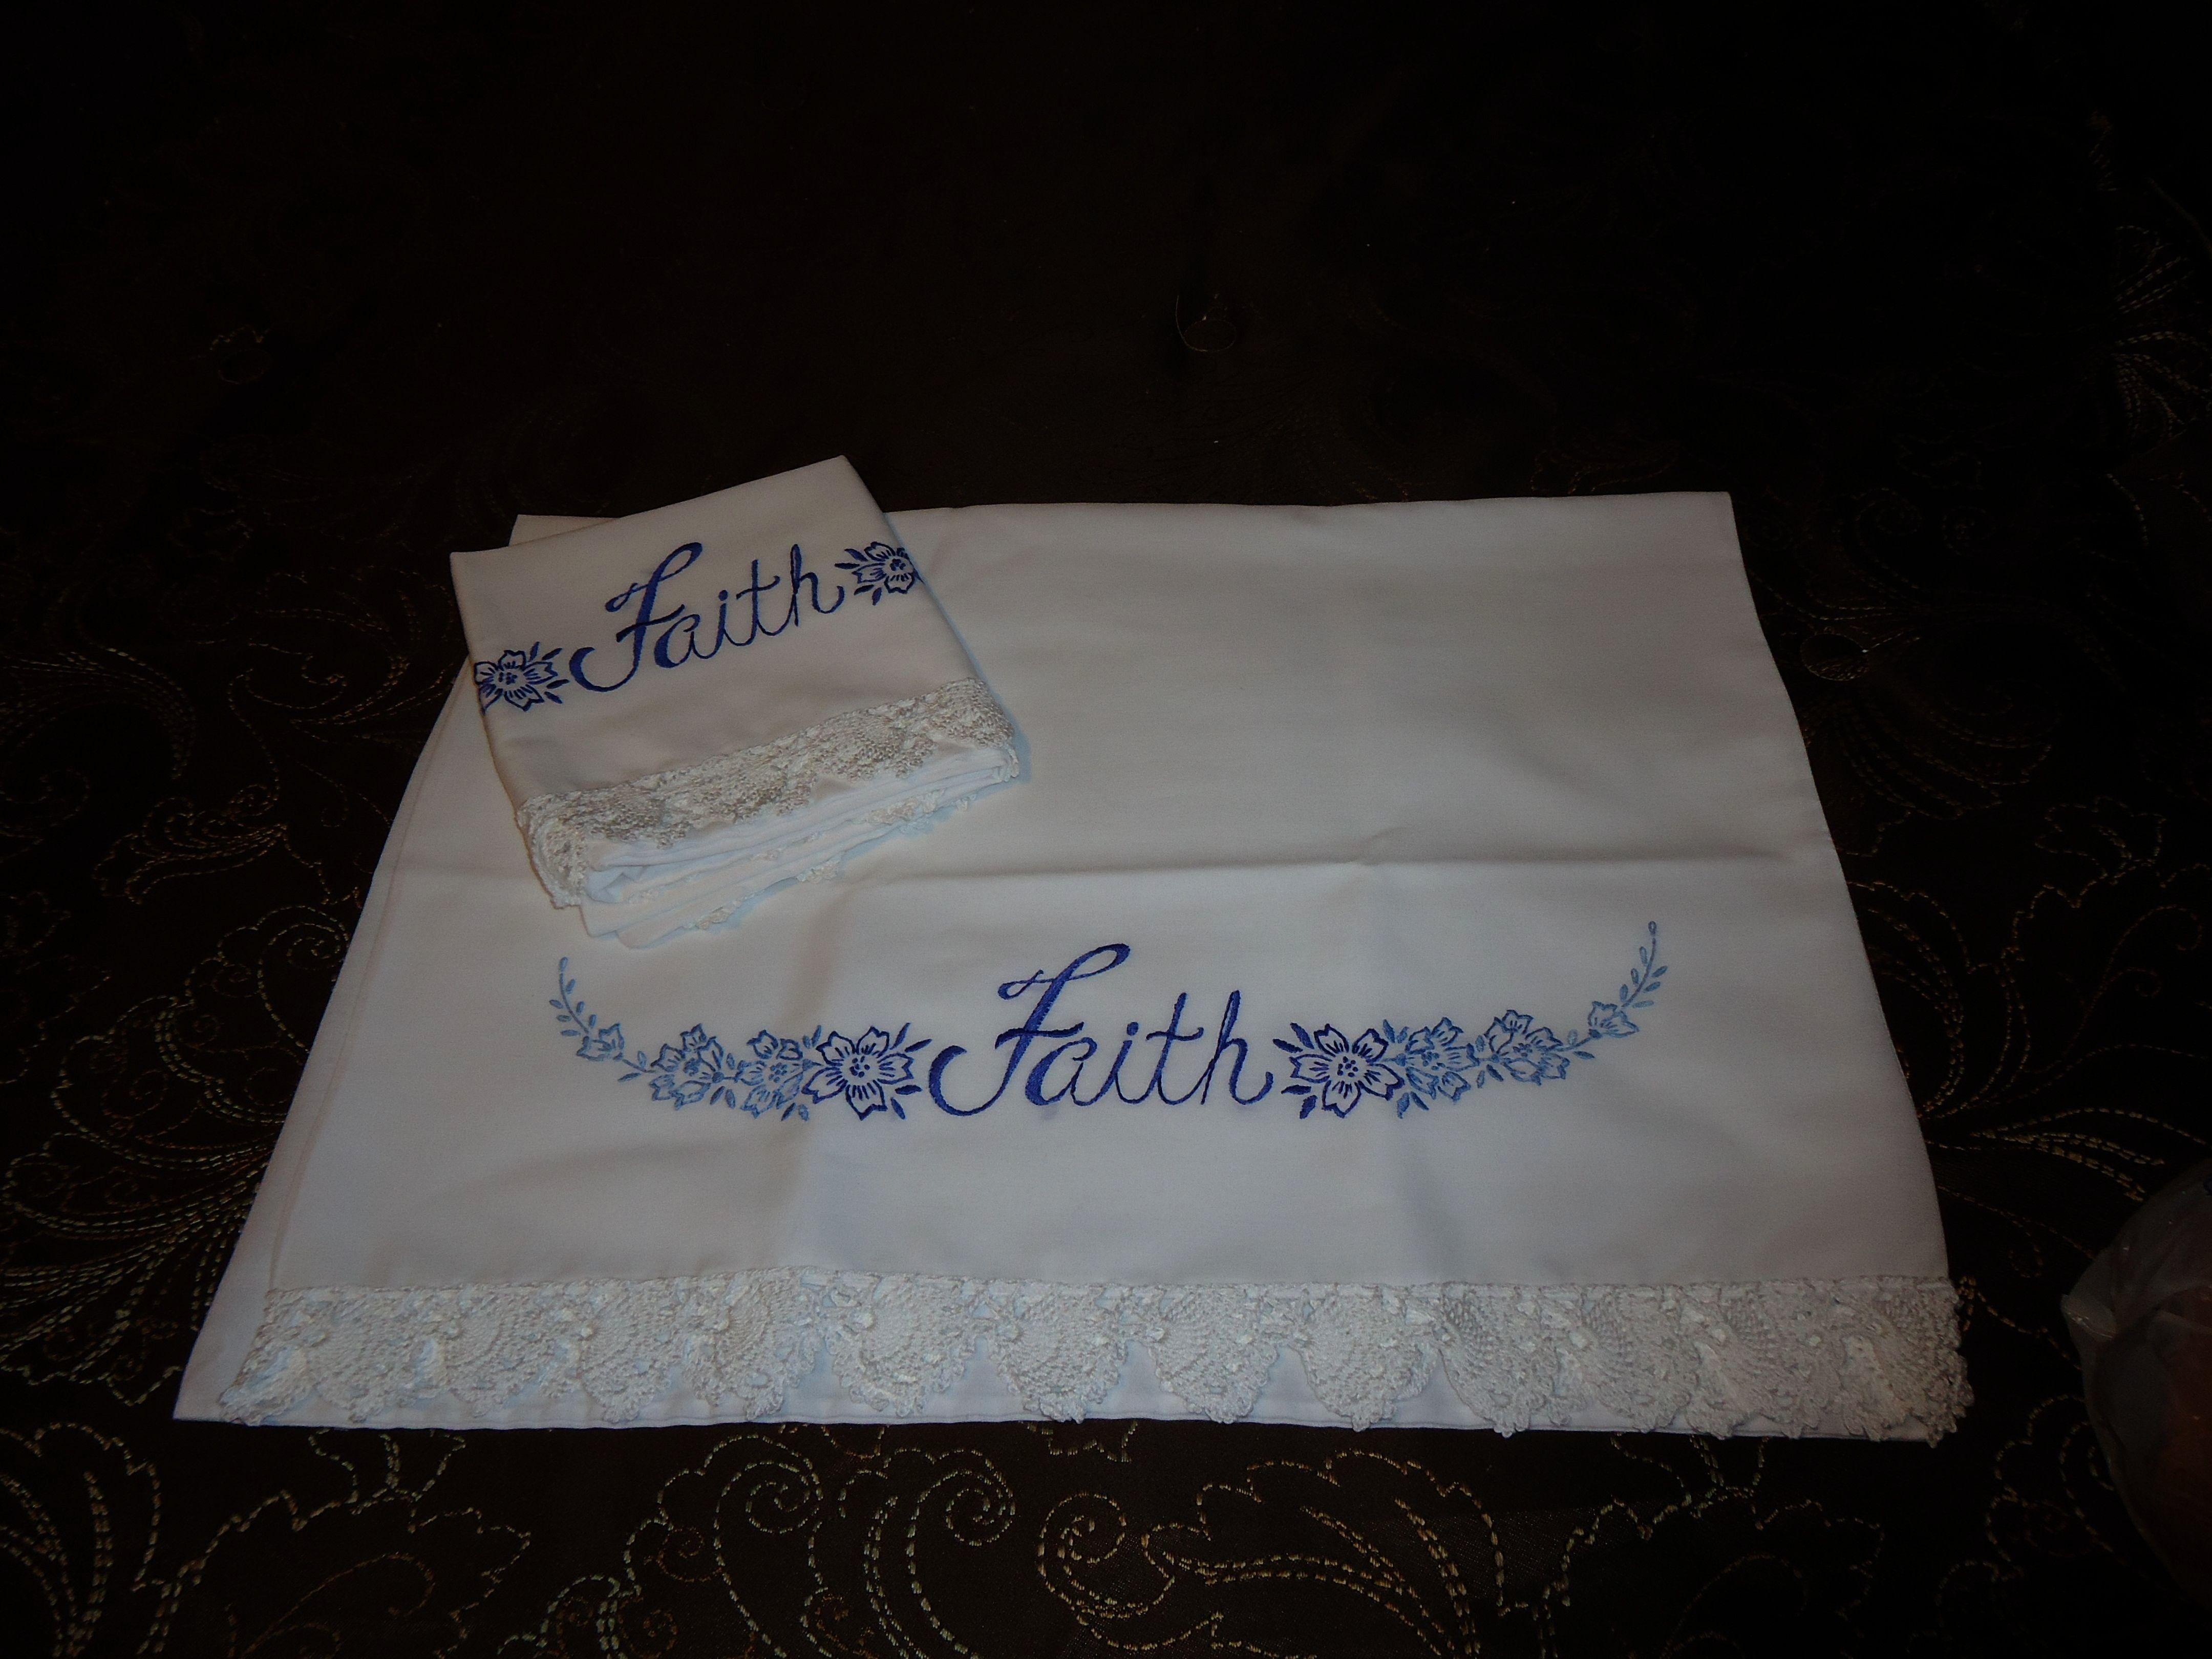 #pillowedgingcrochet #embroidery #crochet #pillow #edging #maeann #faith #case #edgi #and #by #cFaith pillow case, embroidery and crochet edging by Mae-Ann :  Faith pillow case... :  Faith pillow case, embroidery and crochet edging by Mae-Ann :  Faith pillow case… :  Faith pillow case, embroidery and crochet edging by Mae-Ann :  Faith pillow case… :  Faith pillow case, embroidery and crochet edging by Mae-Ann :  Faith pillow case, embroidery and crochet edging by Mae-Ann   Faith pillow cFaith pi